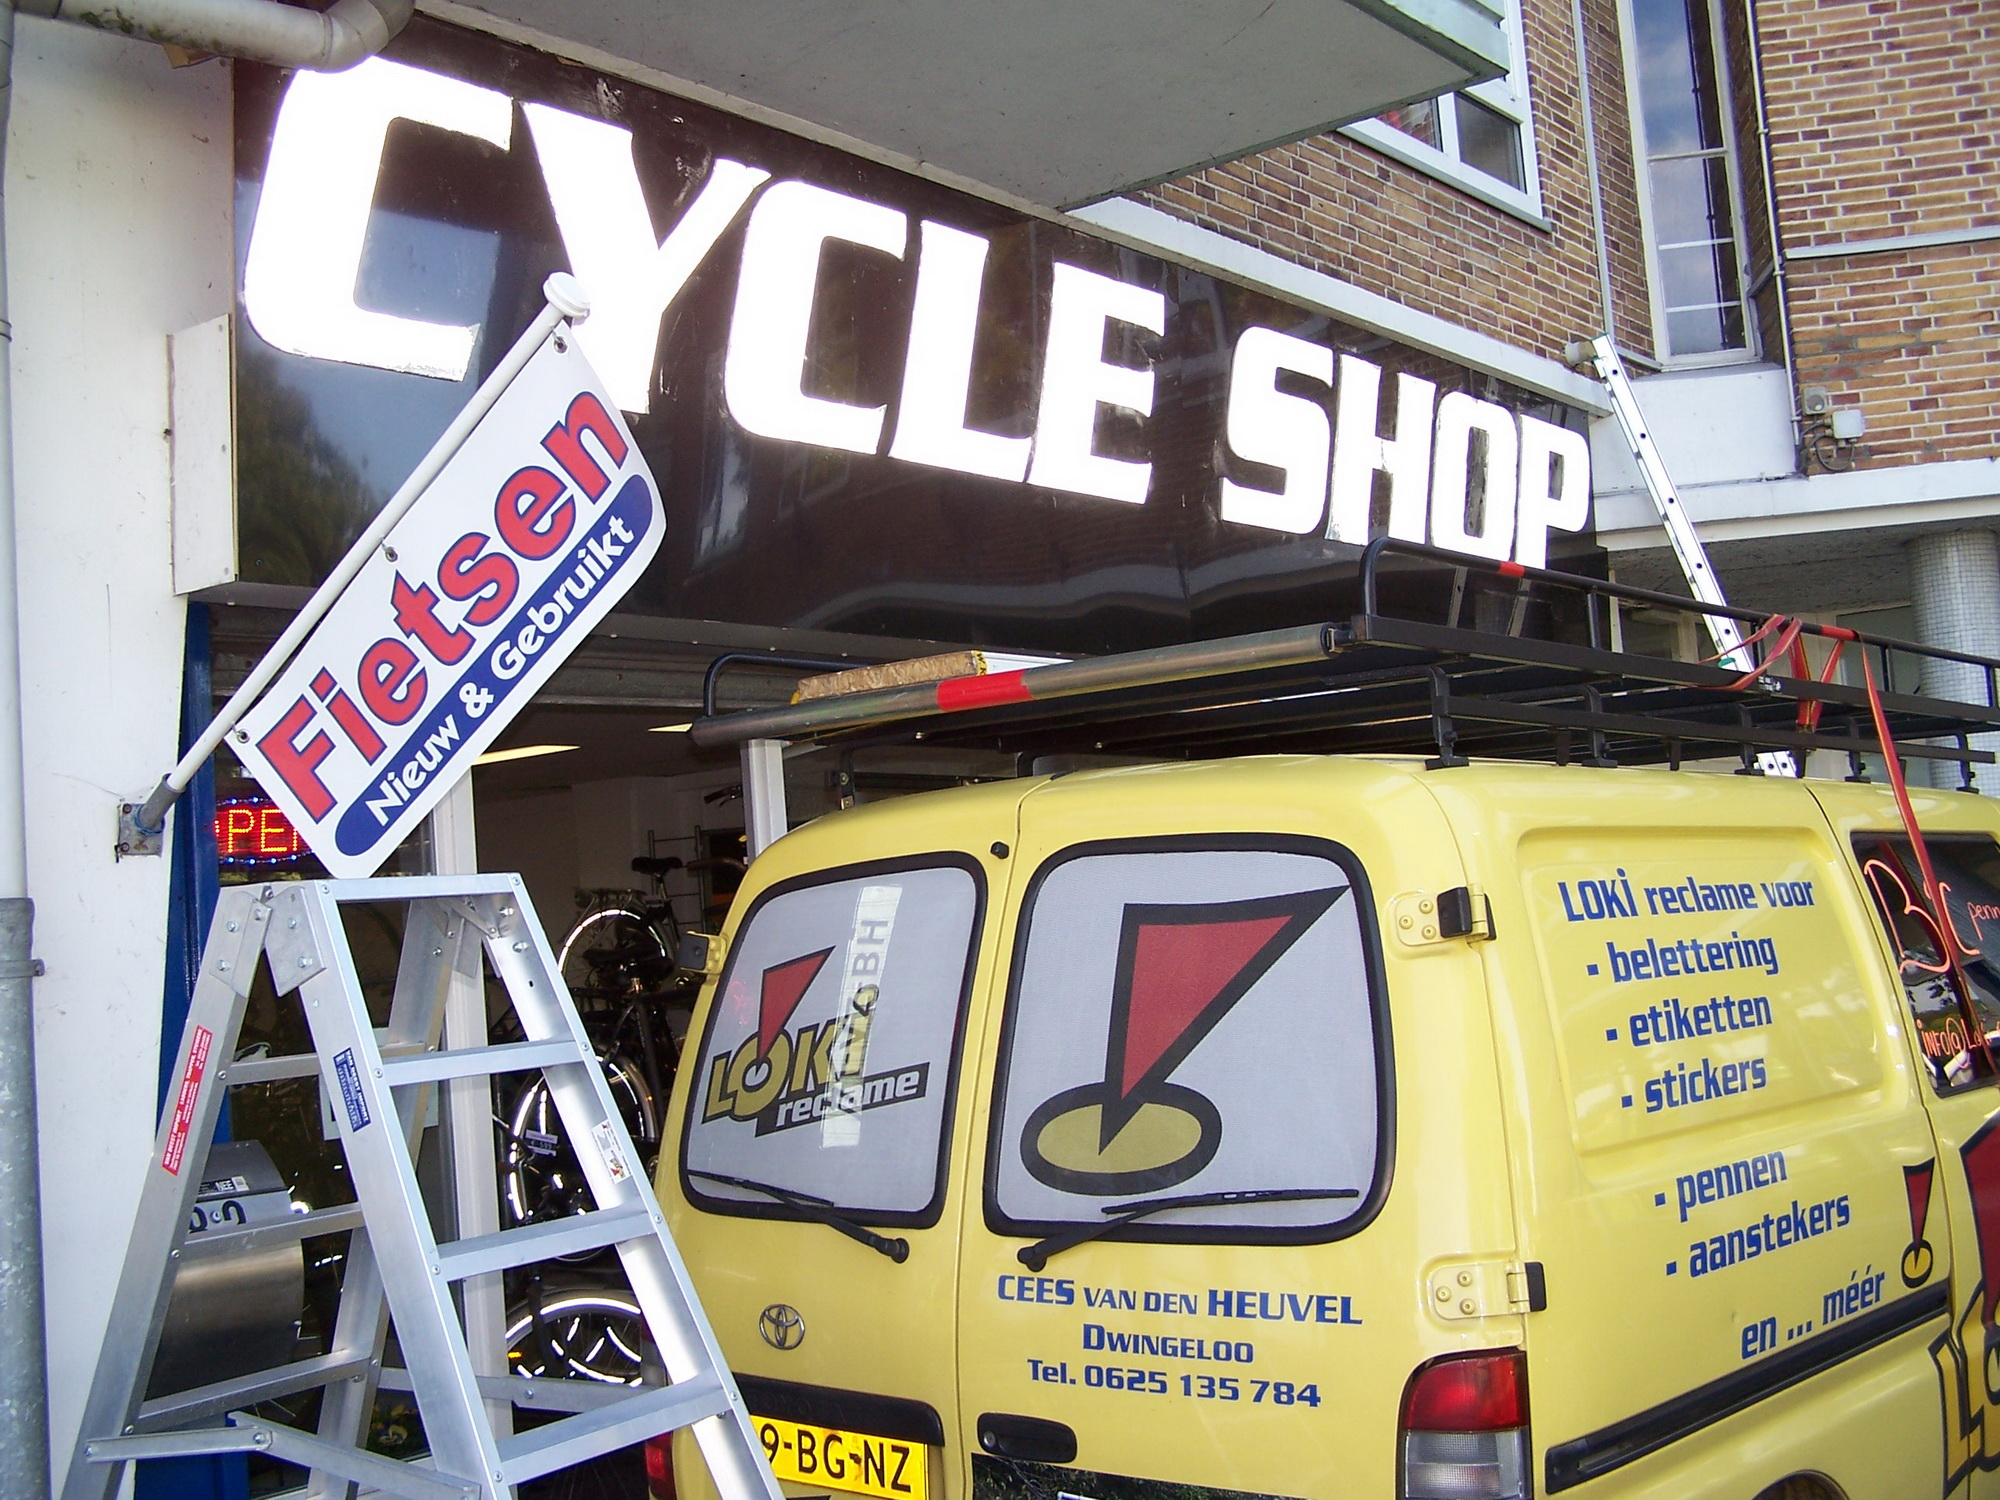 Cycle Shop